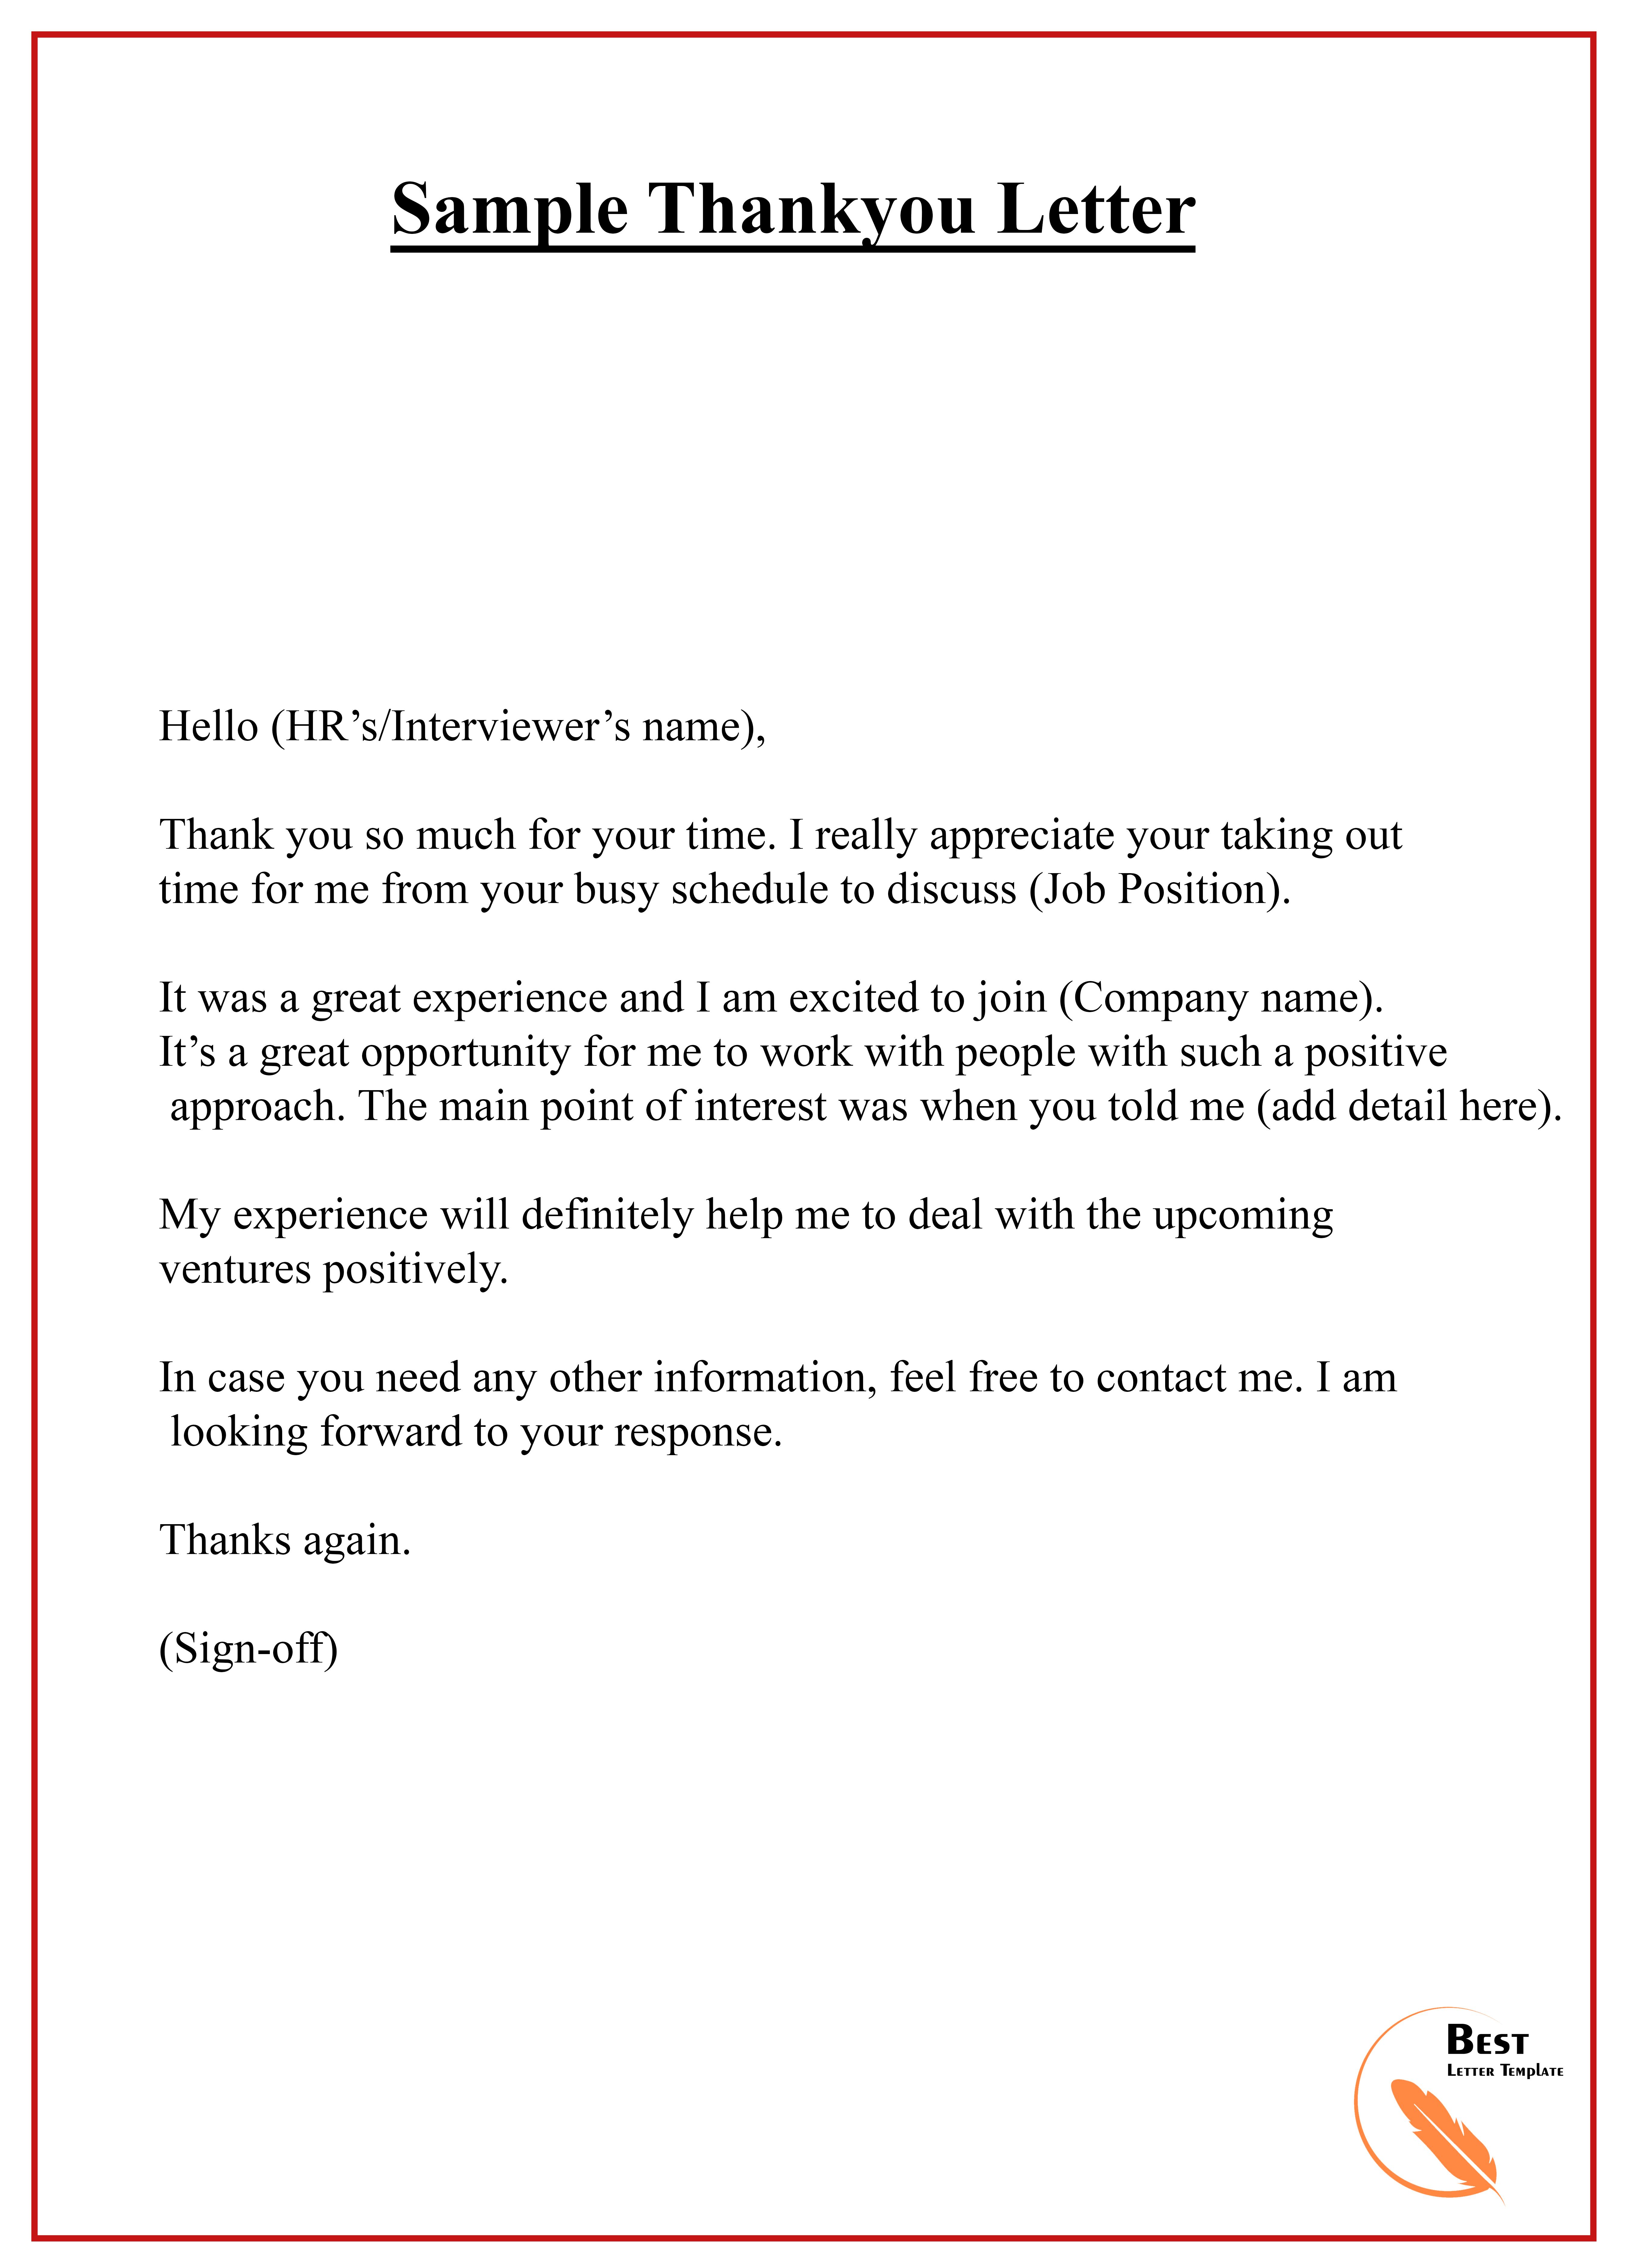 Thankyou Letter Best Letter Template